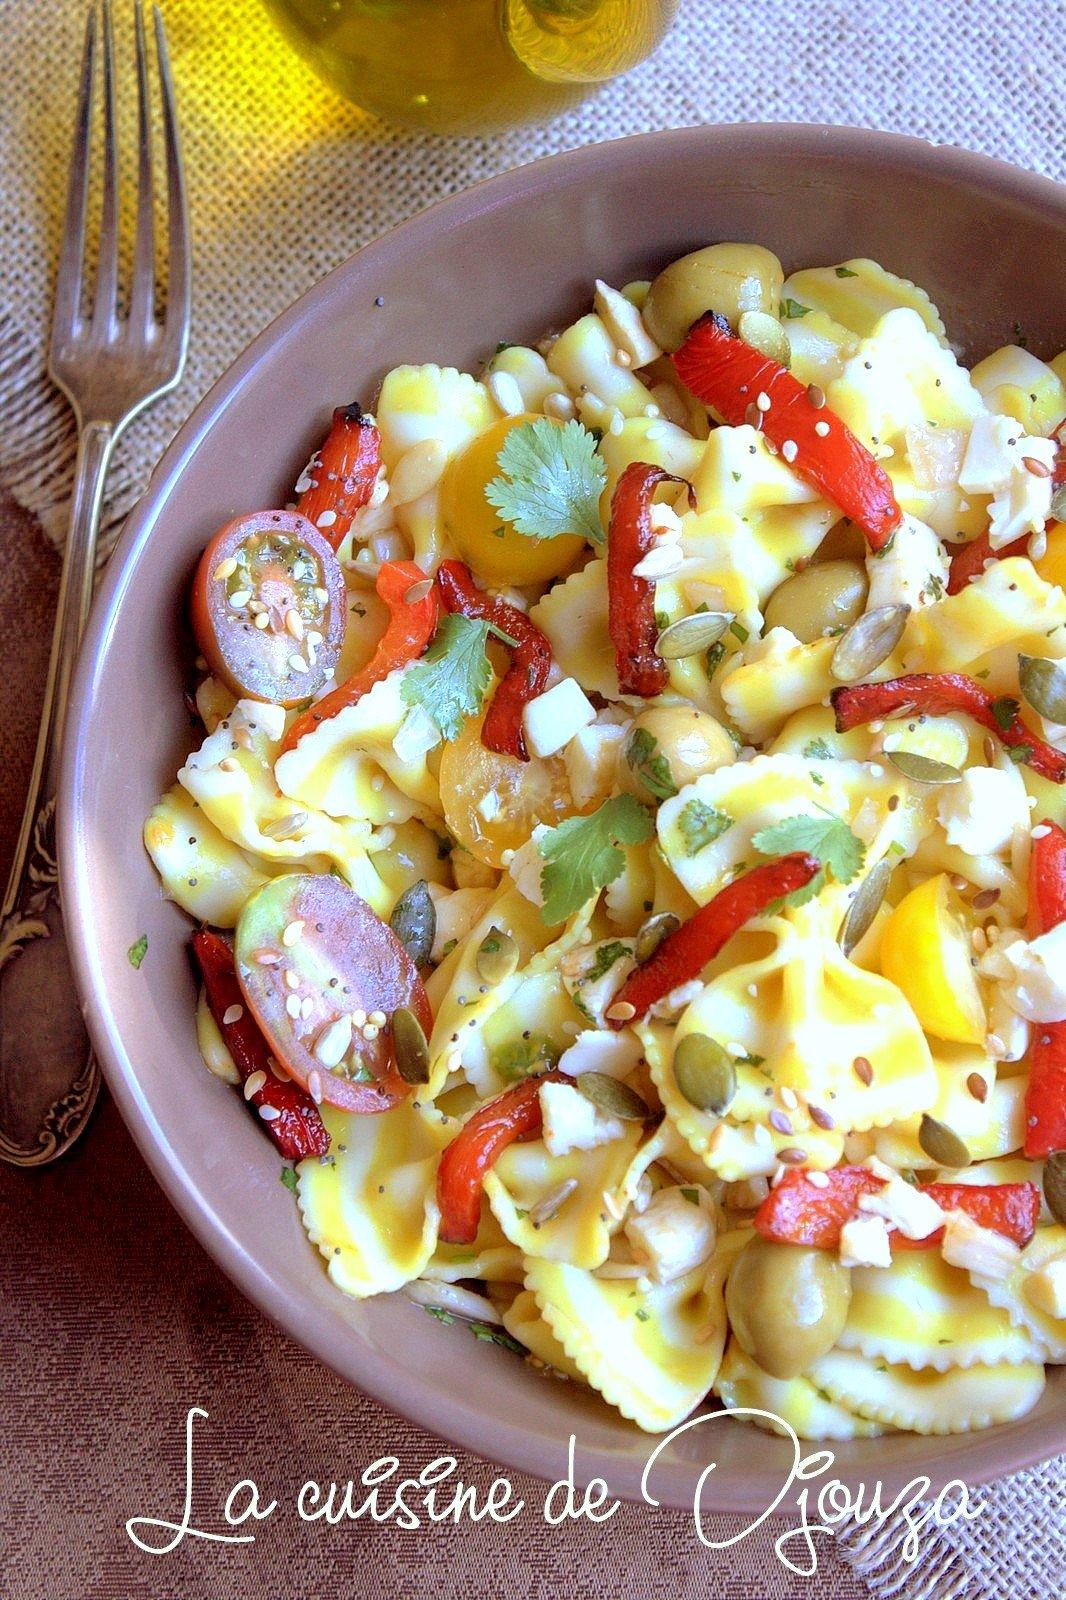 Salade de pates froide italienne